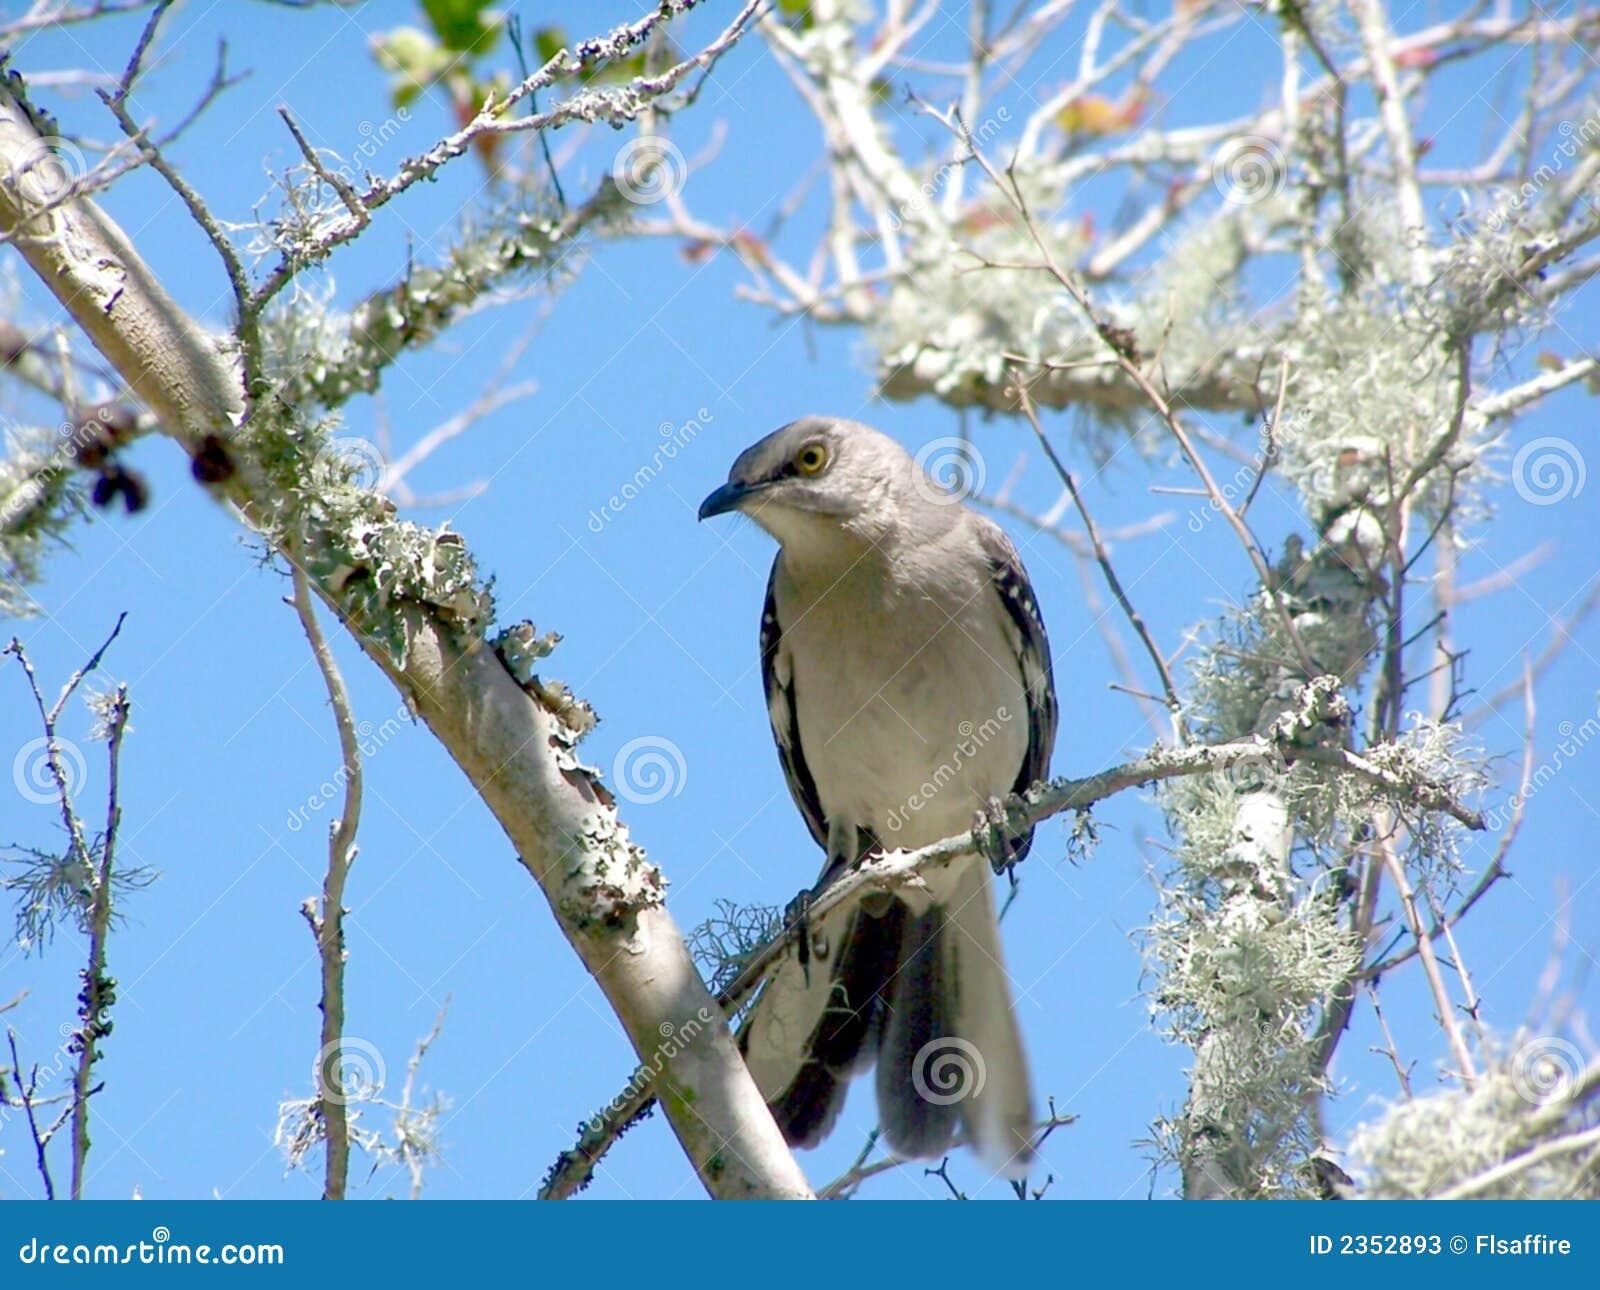 Mocking Bird On A Tree Limb Stock Image - Image of pretty ...